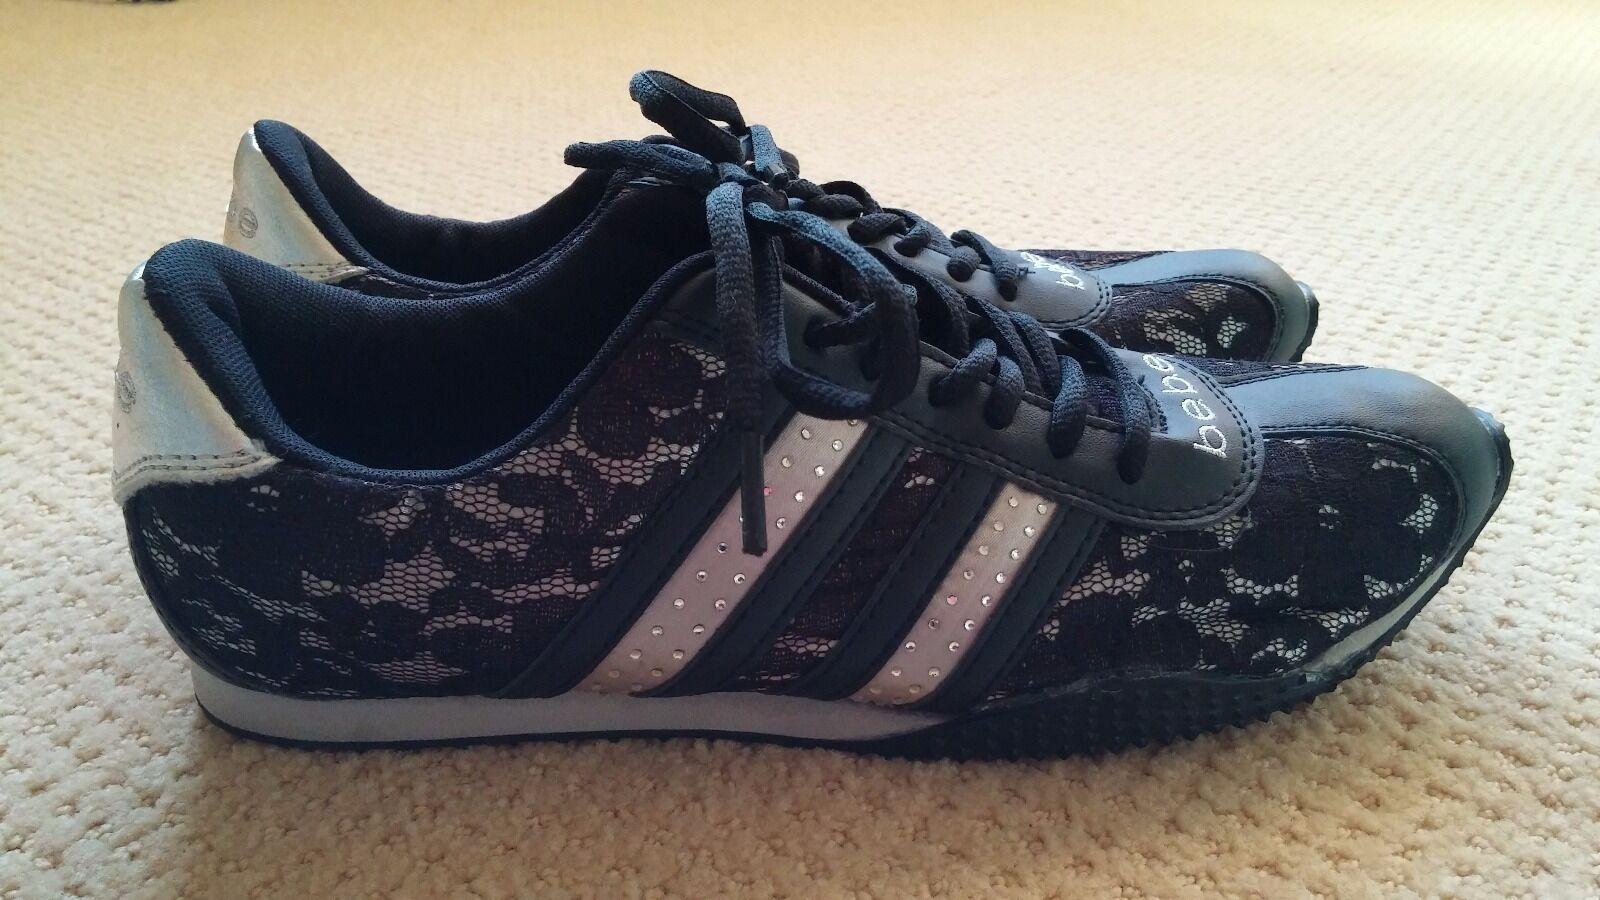 NWOT BEBE Damens's Sporty fashion schuhe RHINESTONE and LACE schwarz silver Größe 8.5